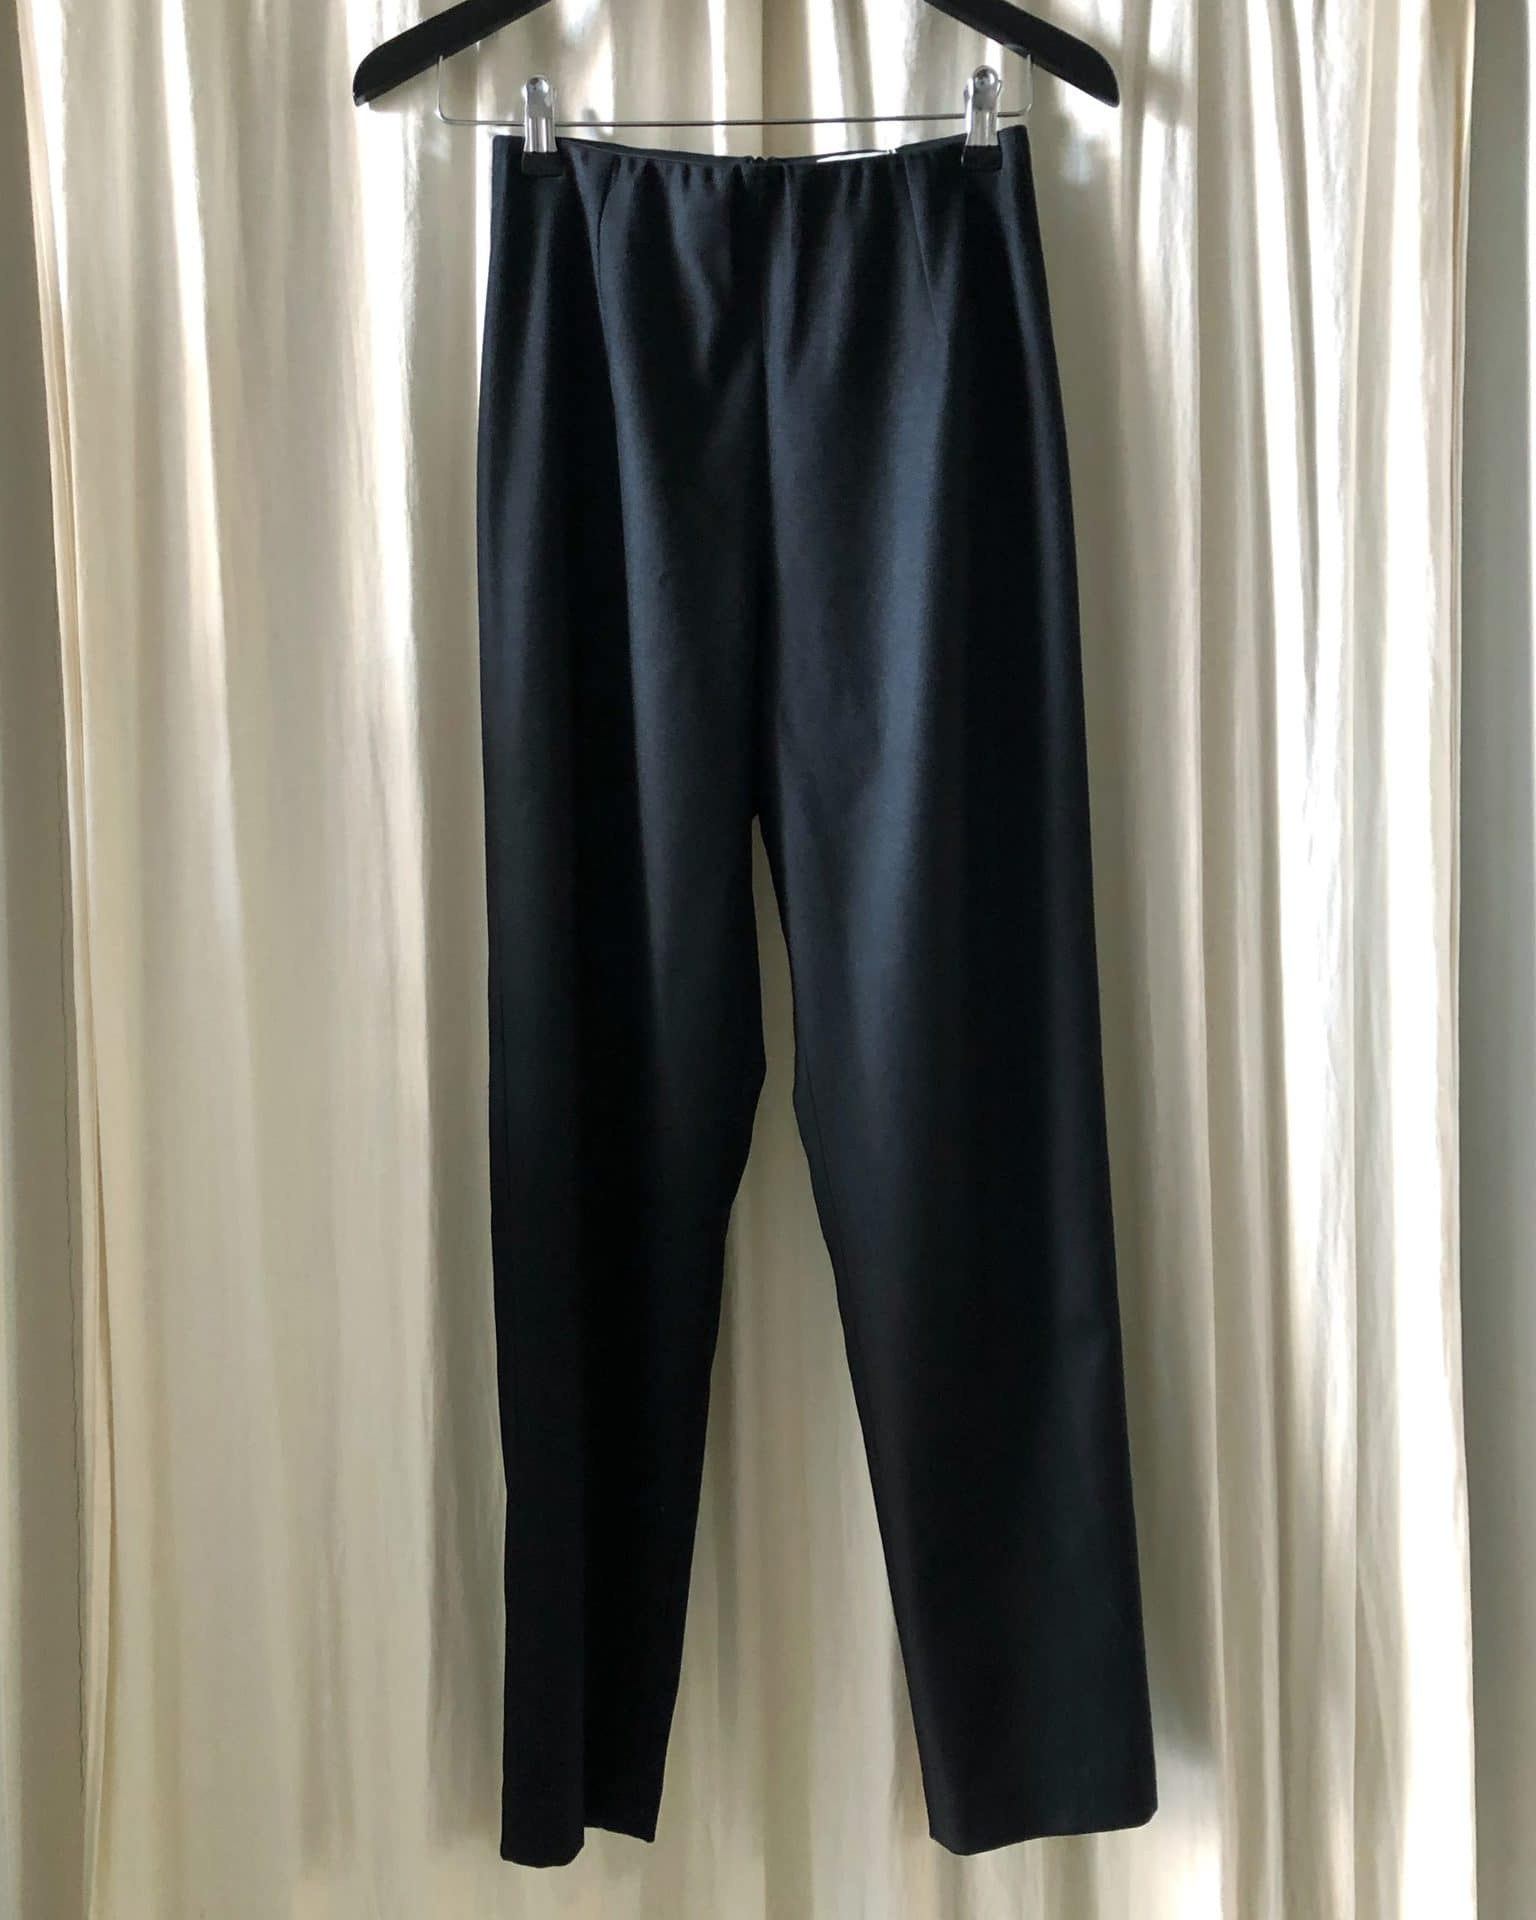 The straight pants black